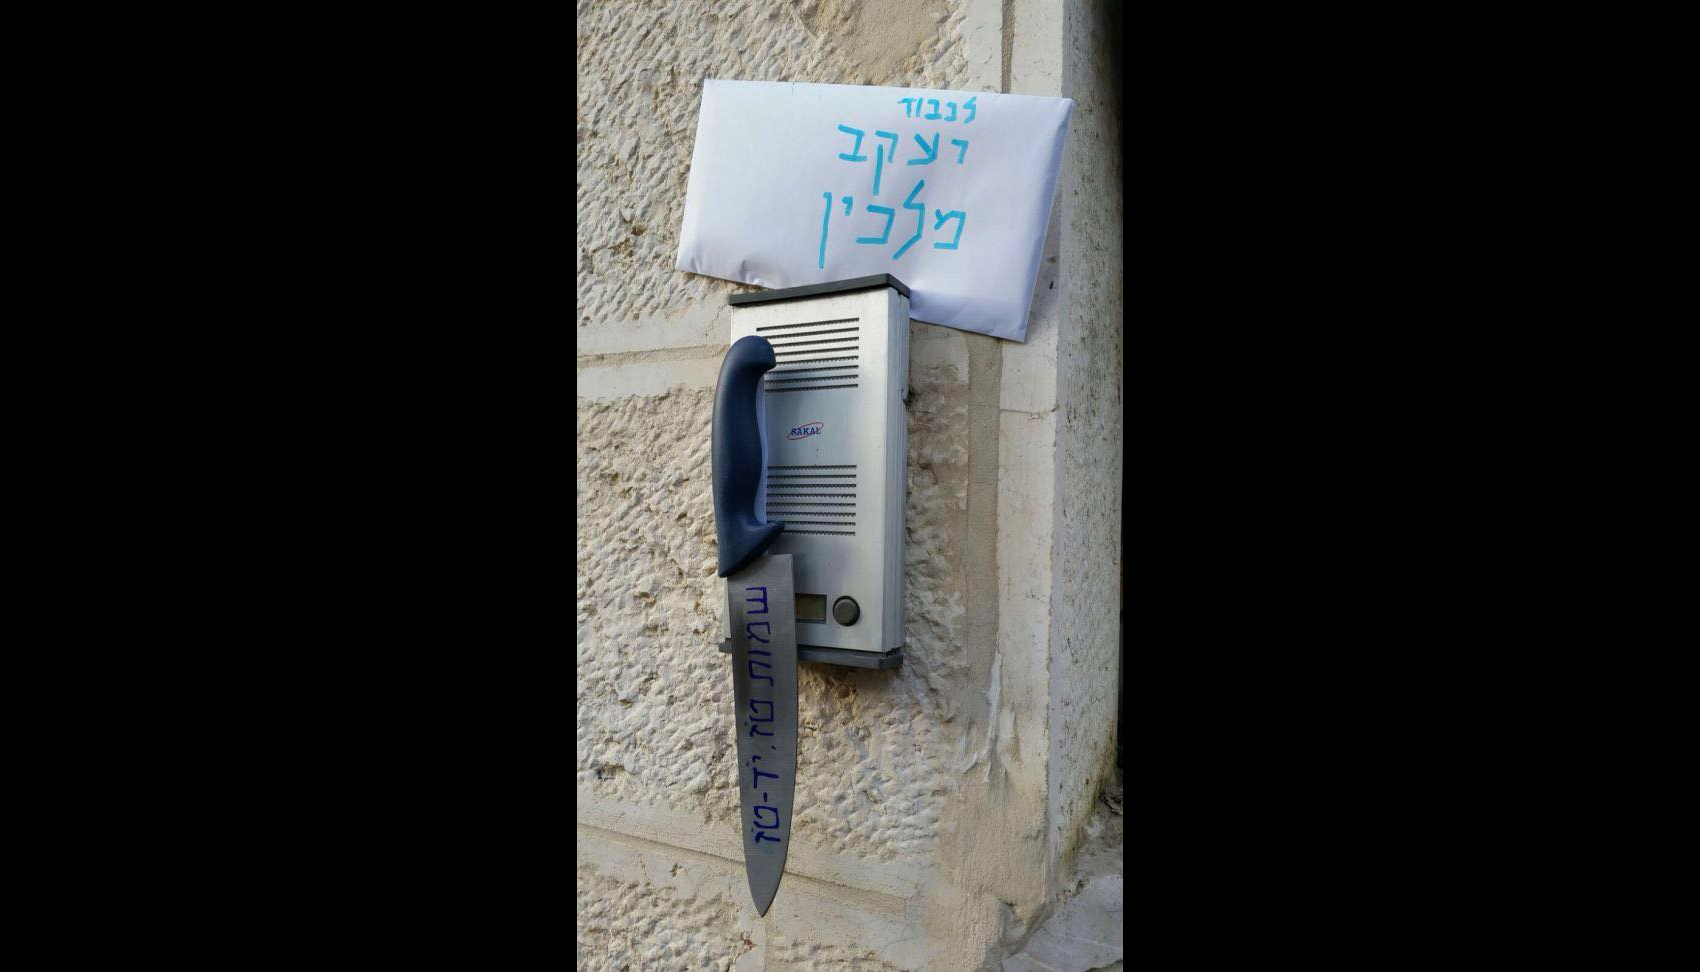 IsraelThreatJewishAtheist